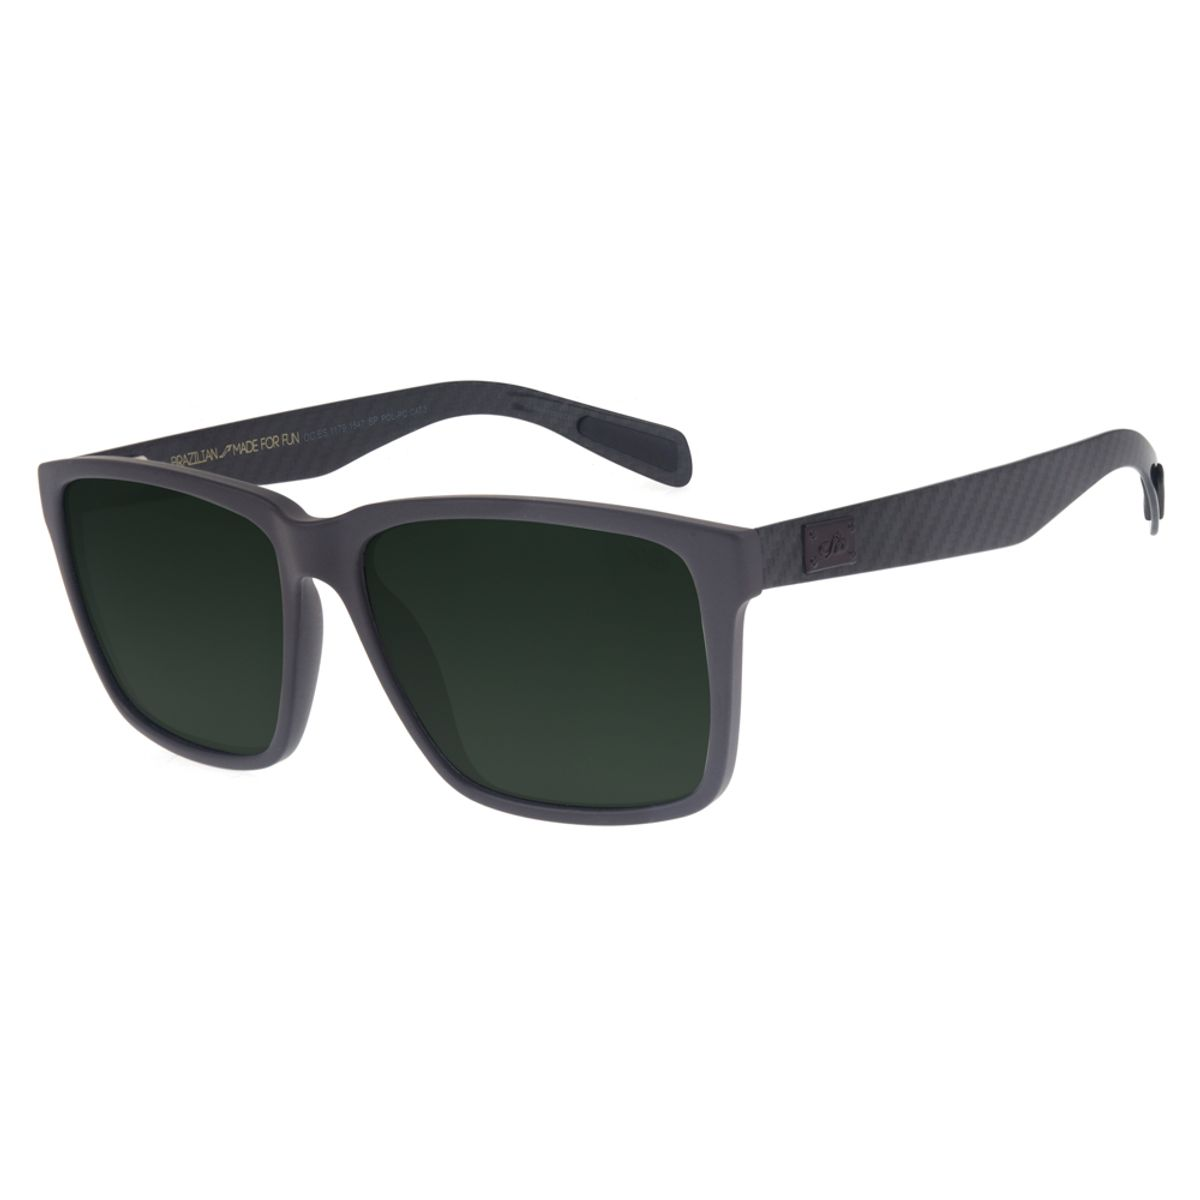 a97f0ffd0 Óculos de Sol Chilli Beans Esportivo Unissex Polarizado Marrom 1179 ...